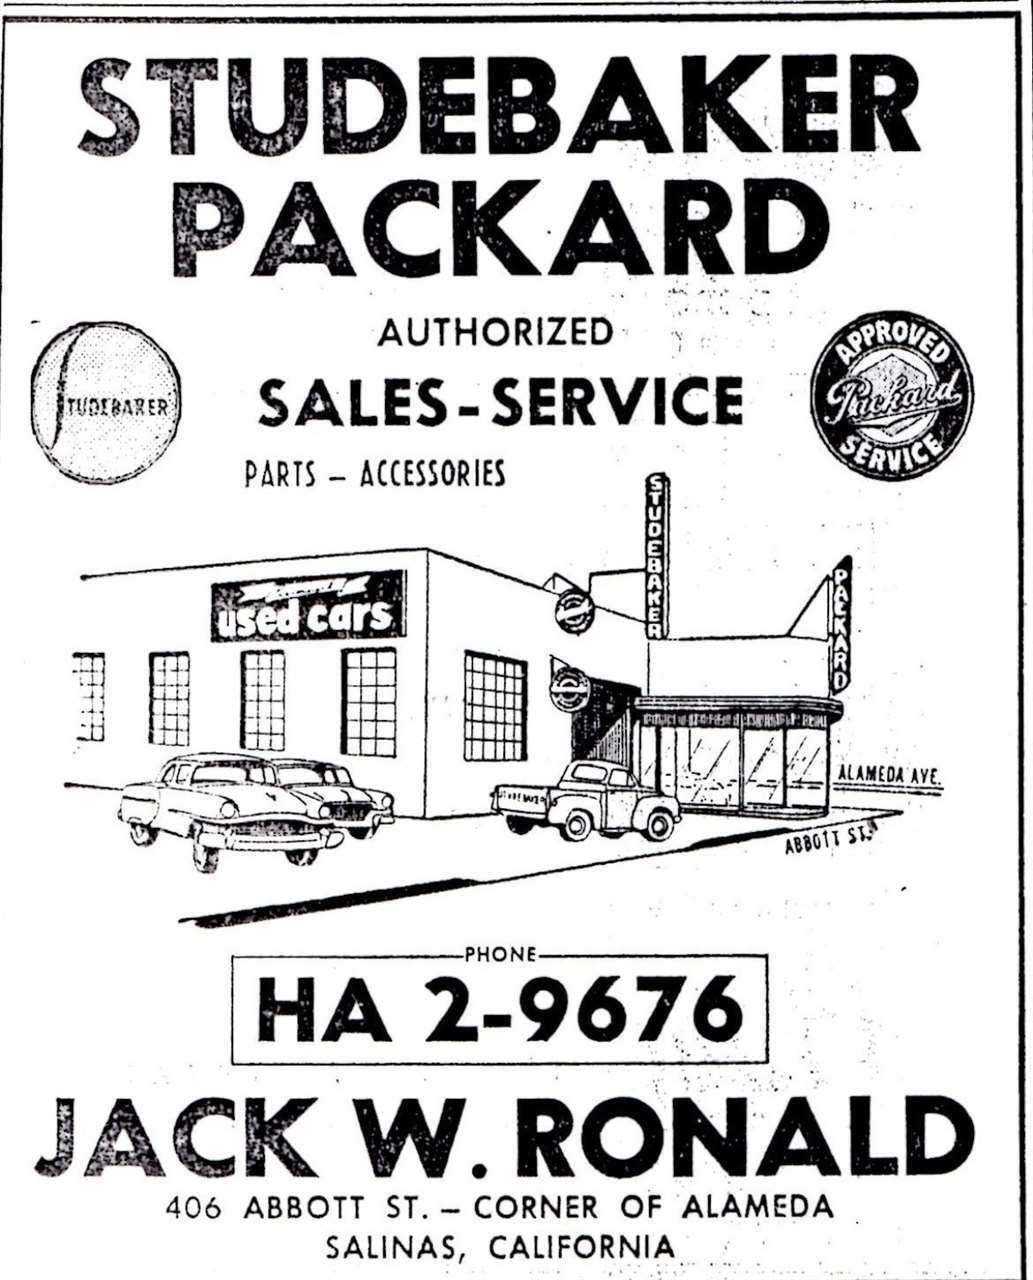 Jack W. Ronald